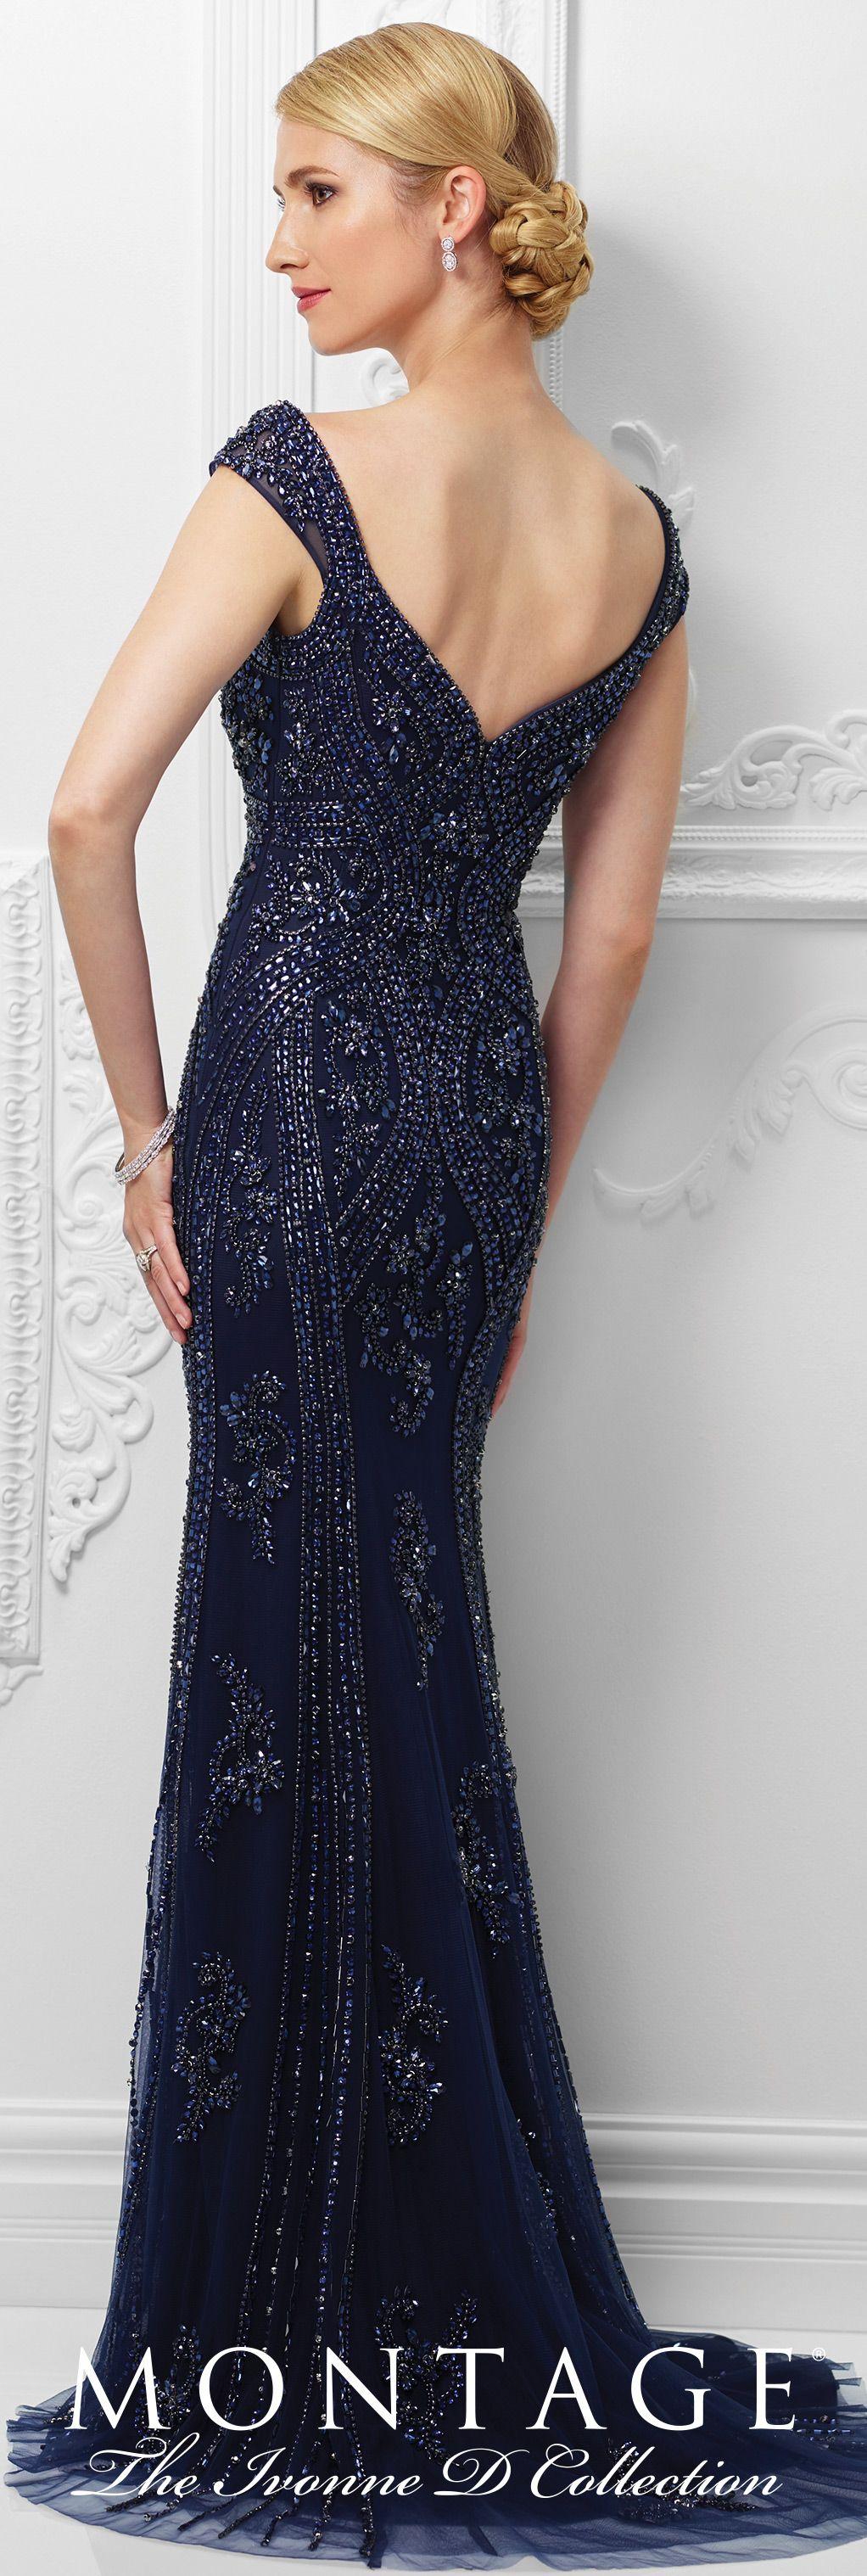 Ivonne d evening dresses d formal cap and navy blue